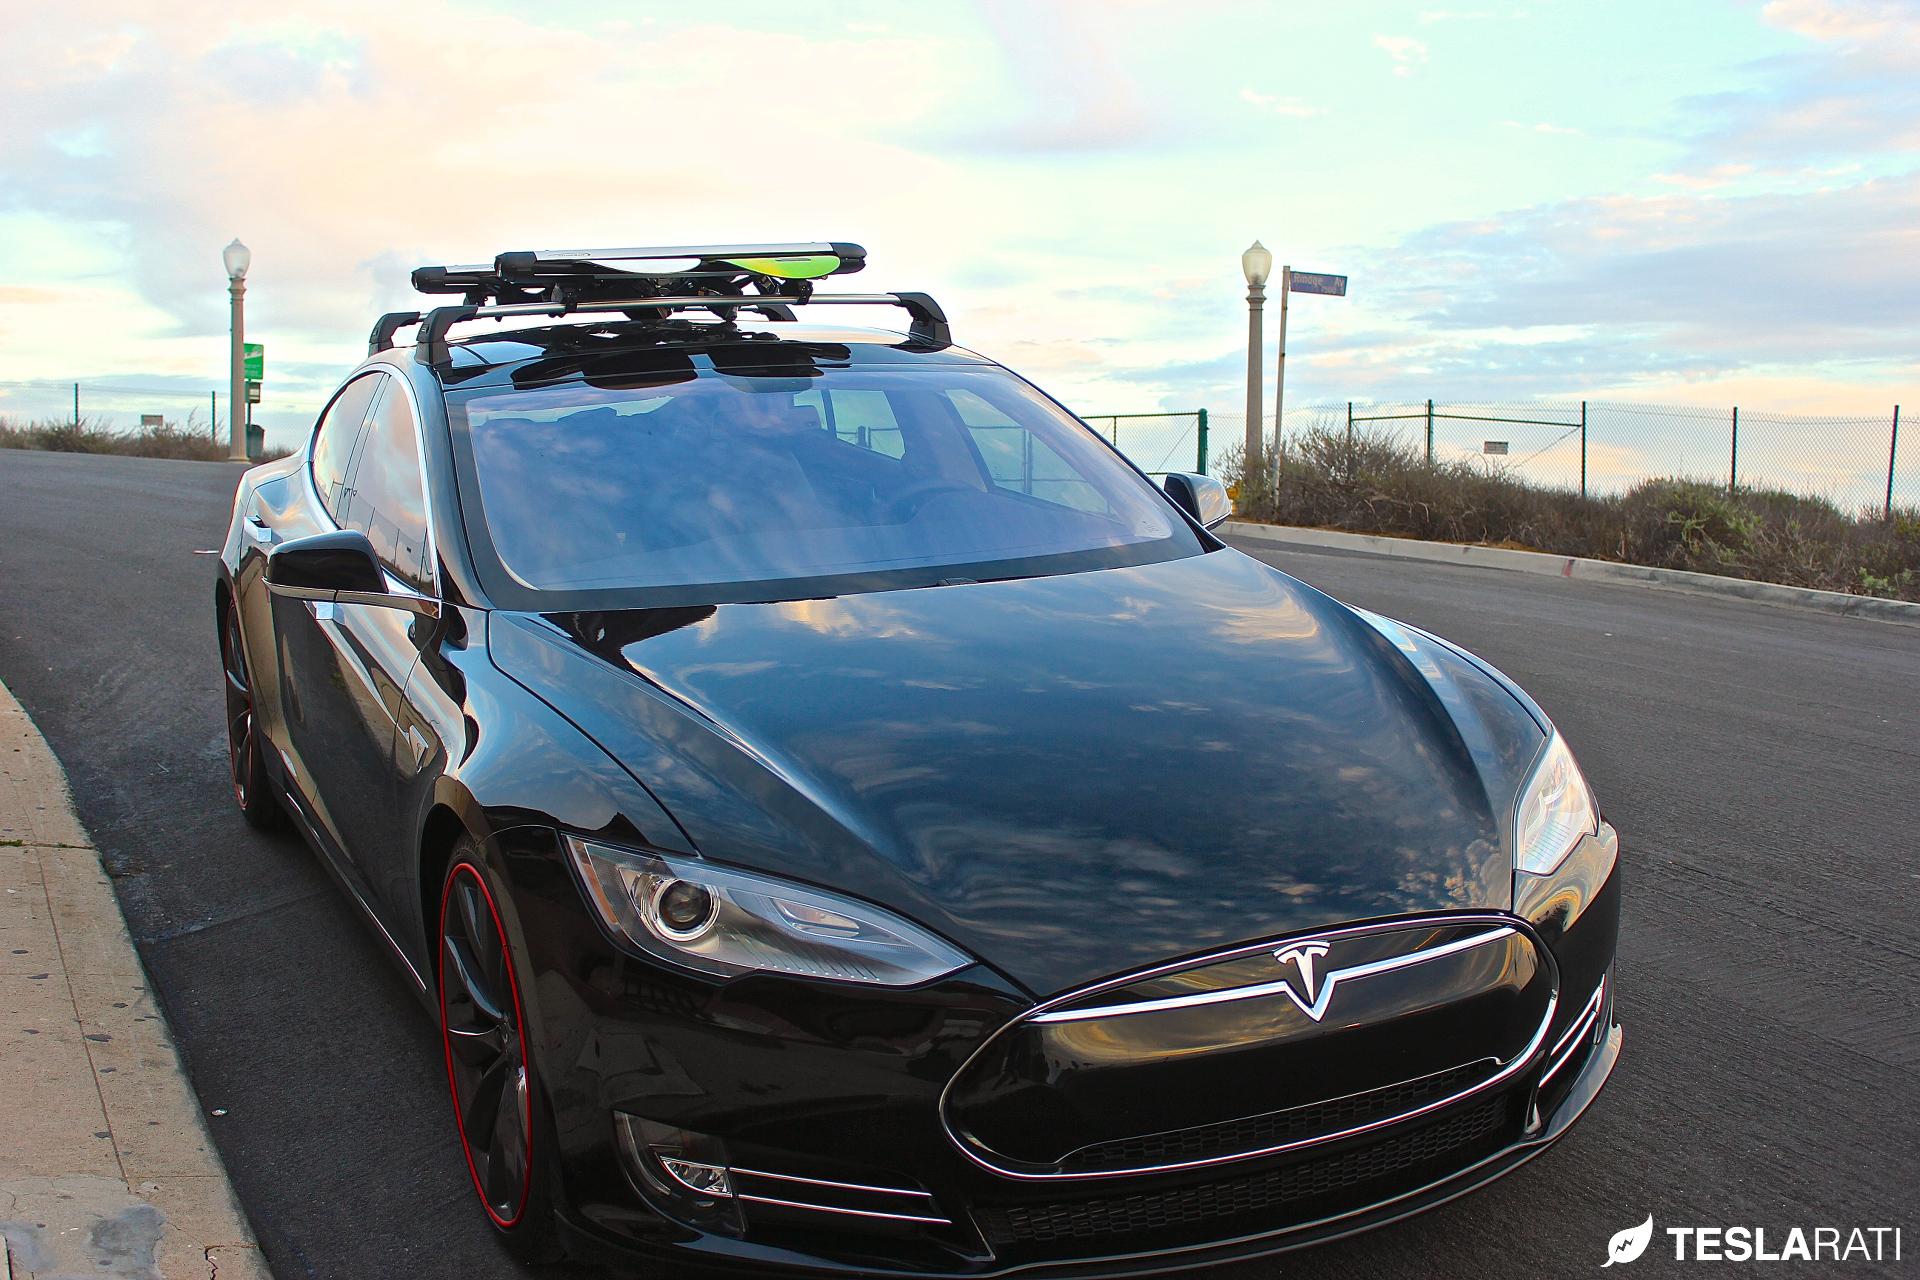 S37W+K930 Tesla Model S Whispbar SILVER Flush Roof Racks To fit 2015 onwards